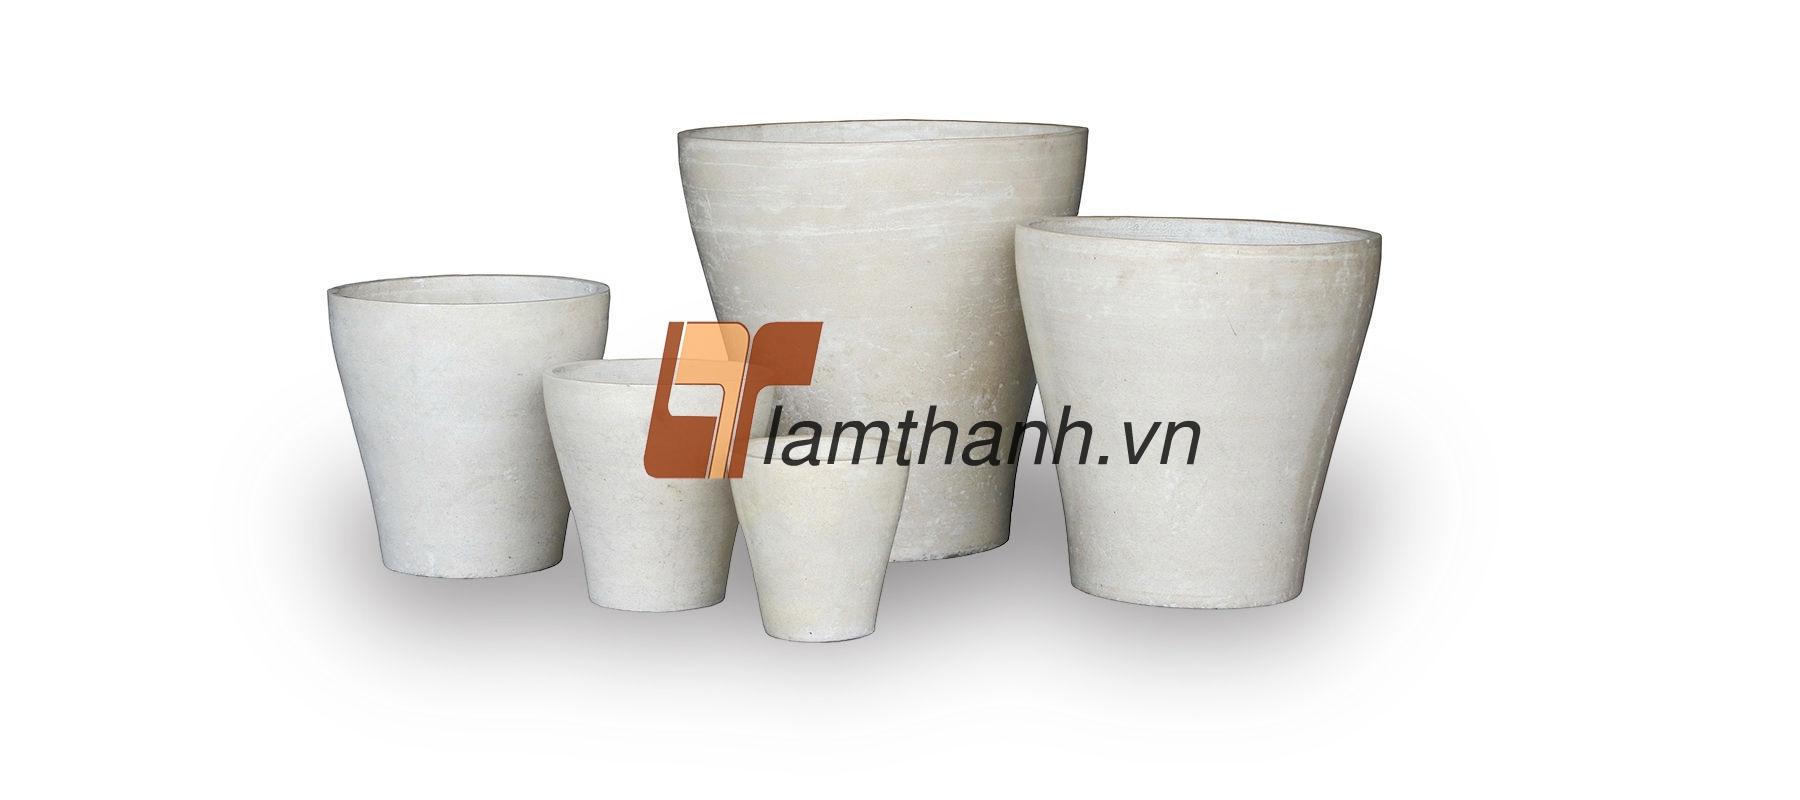 vietnam fibercement, GRC pots 01